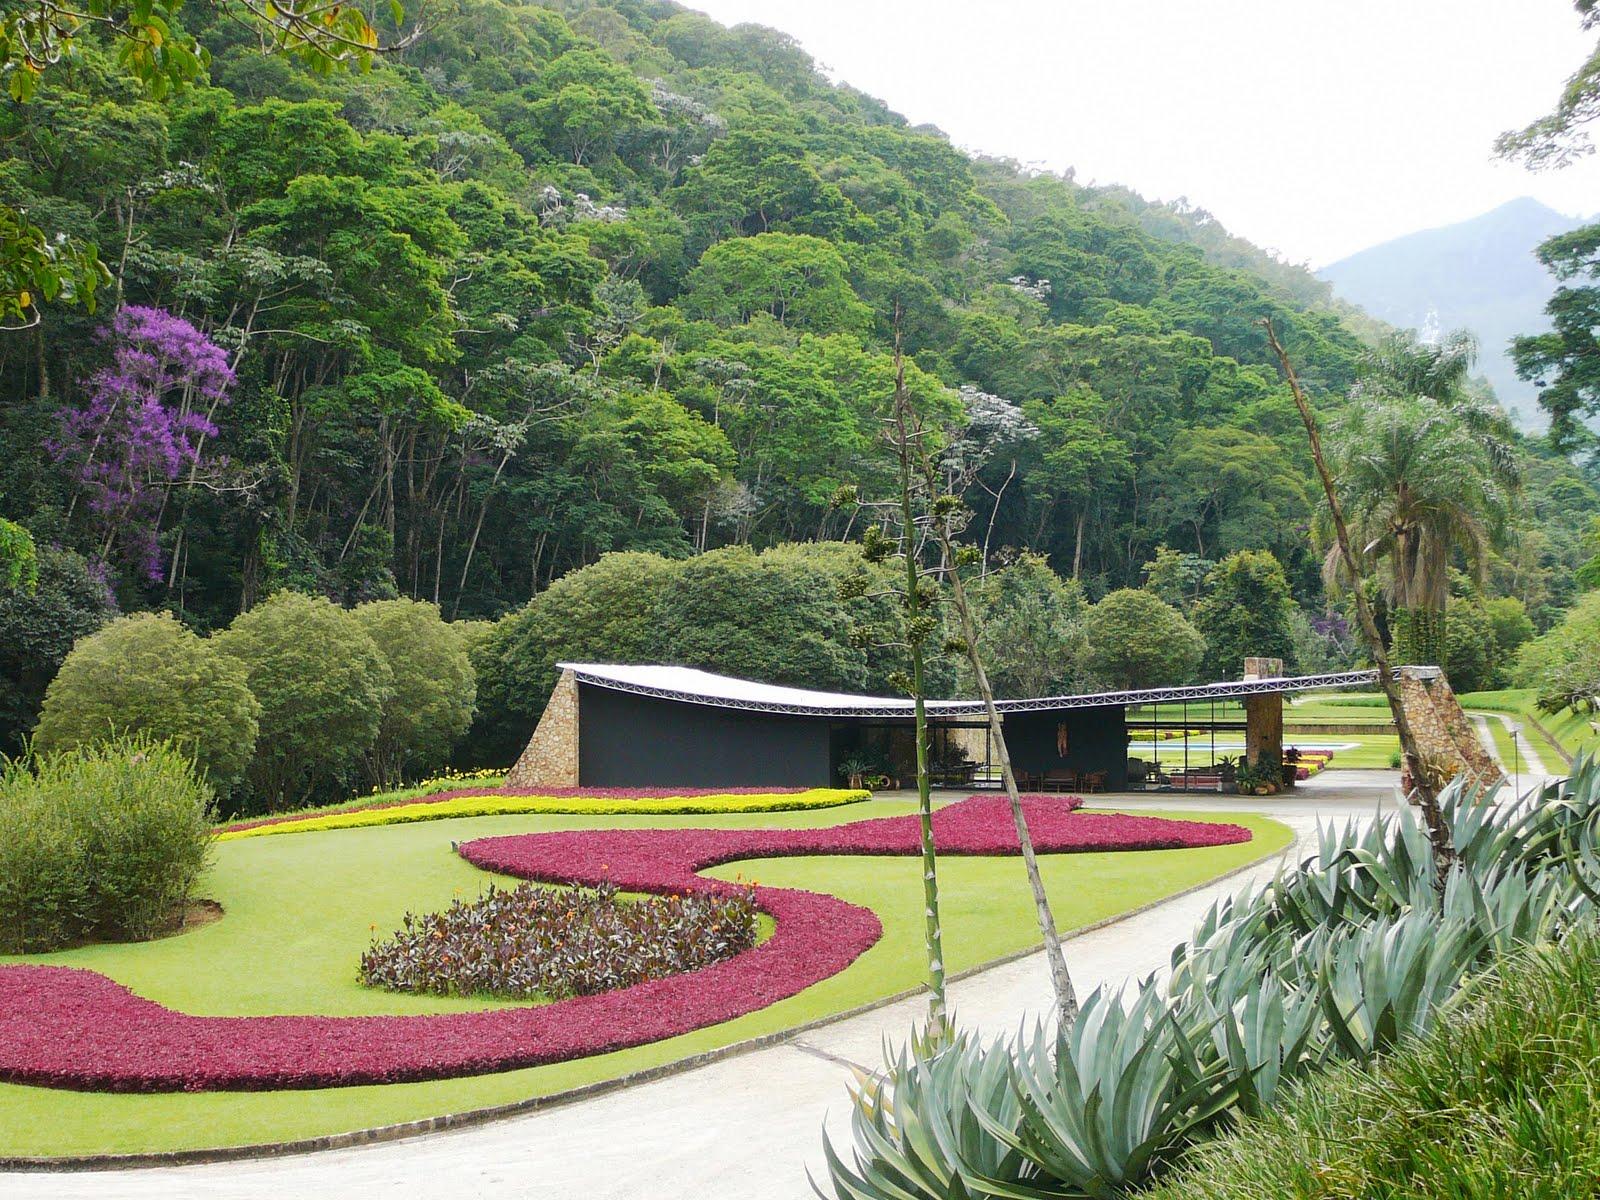 roberto-buler-marx-jardins-pampulha